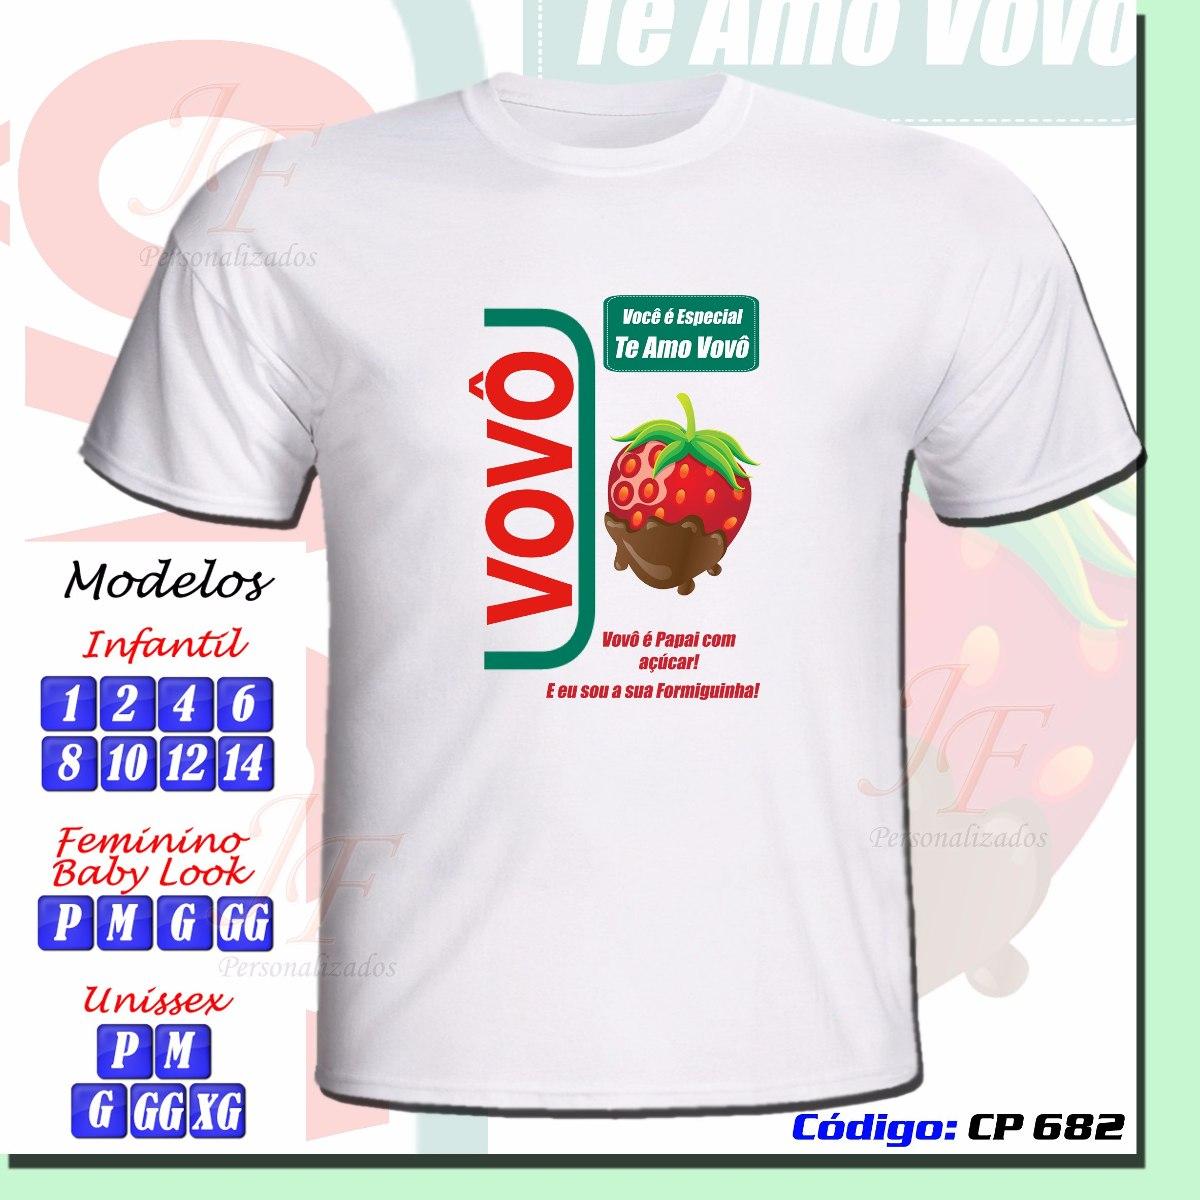 9a76476088 camiseta personalizada adulto infantil vovó vovô. Carregando zoom.